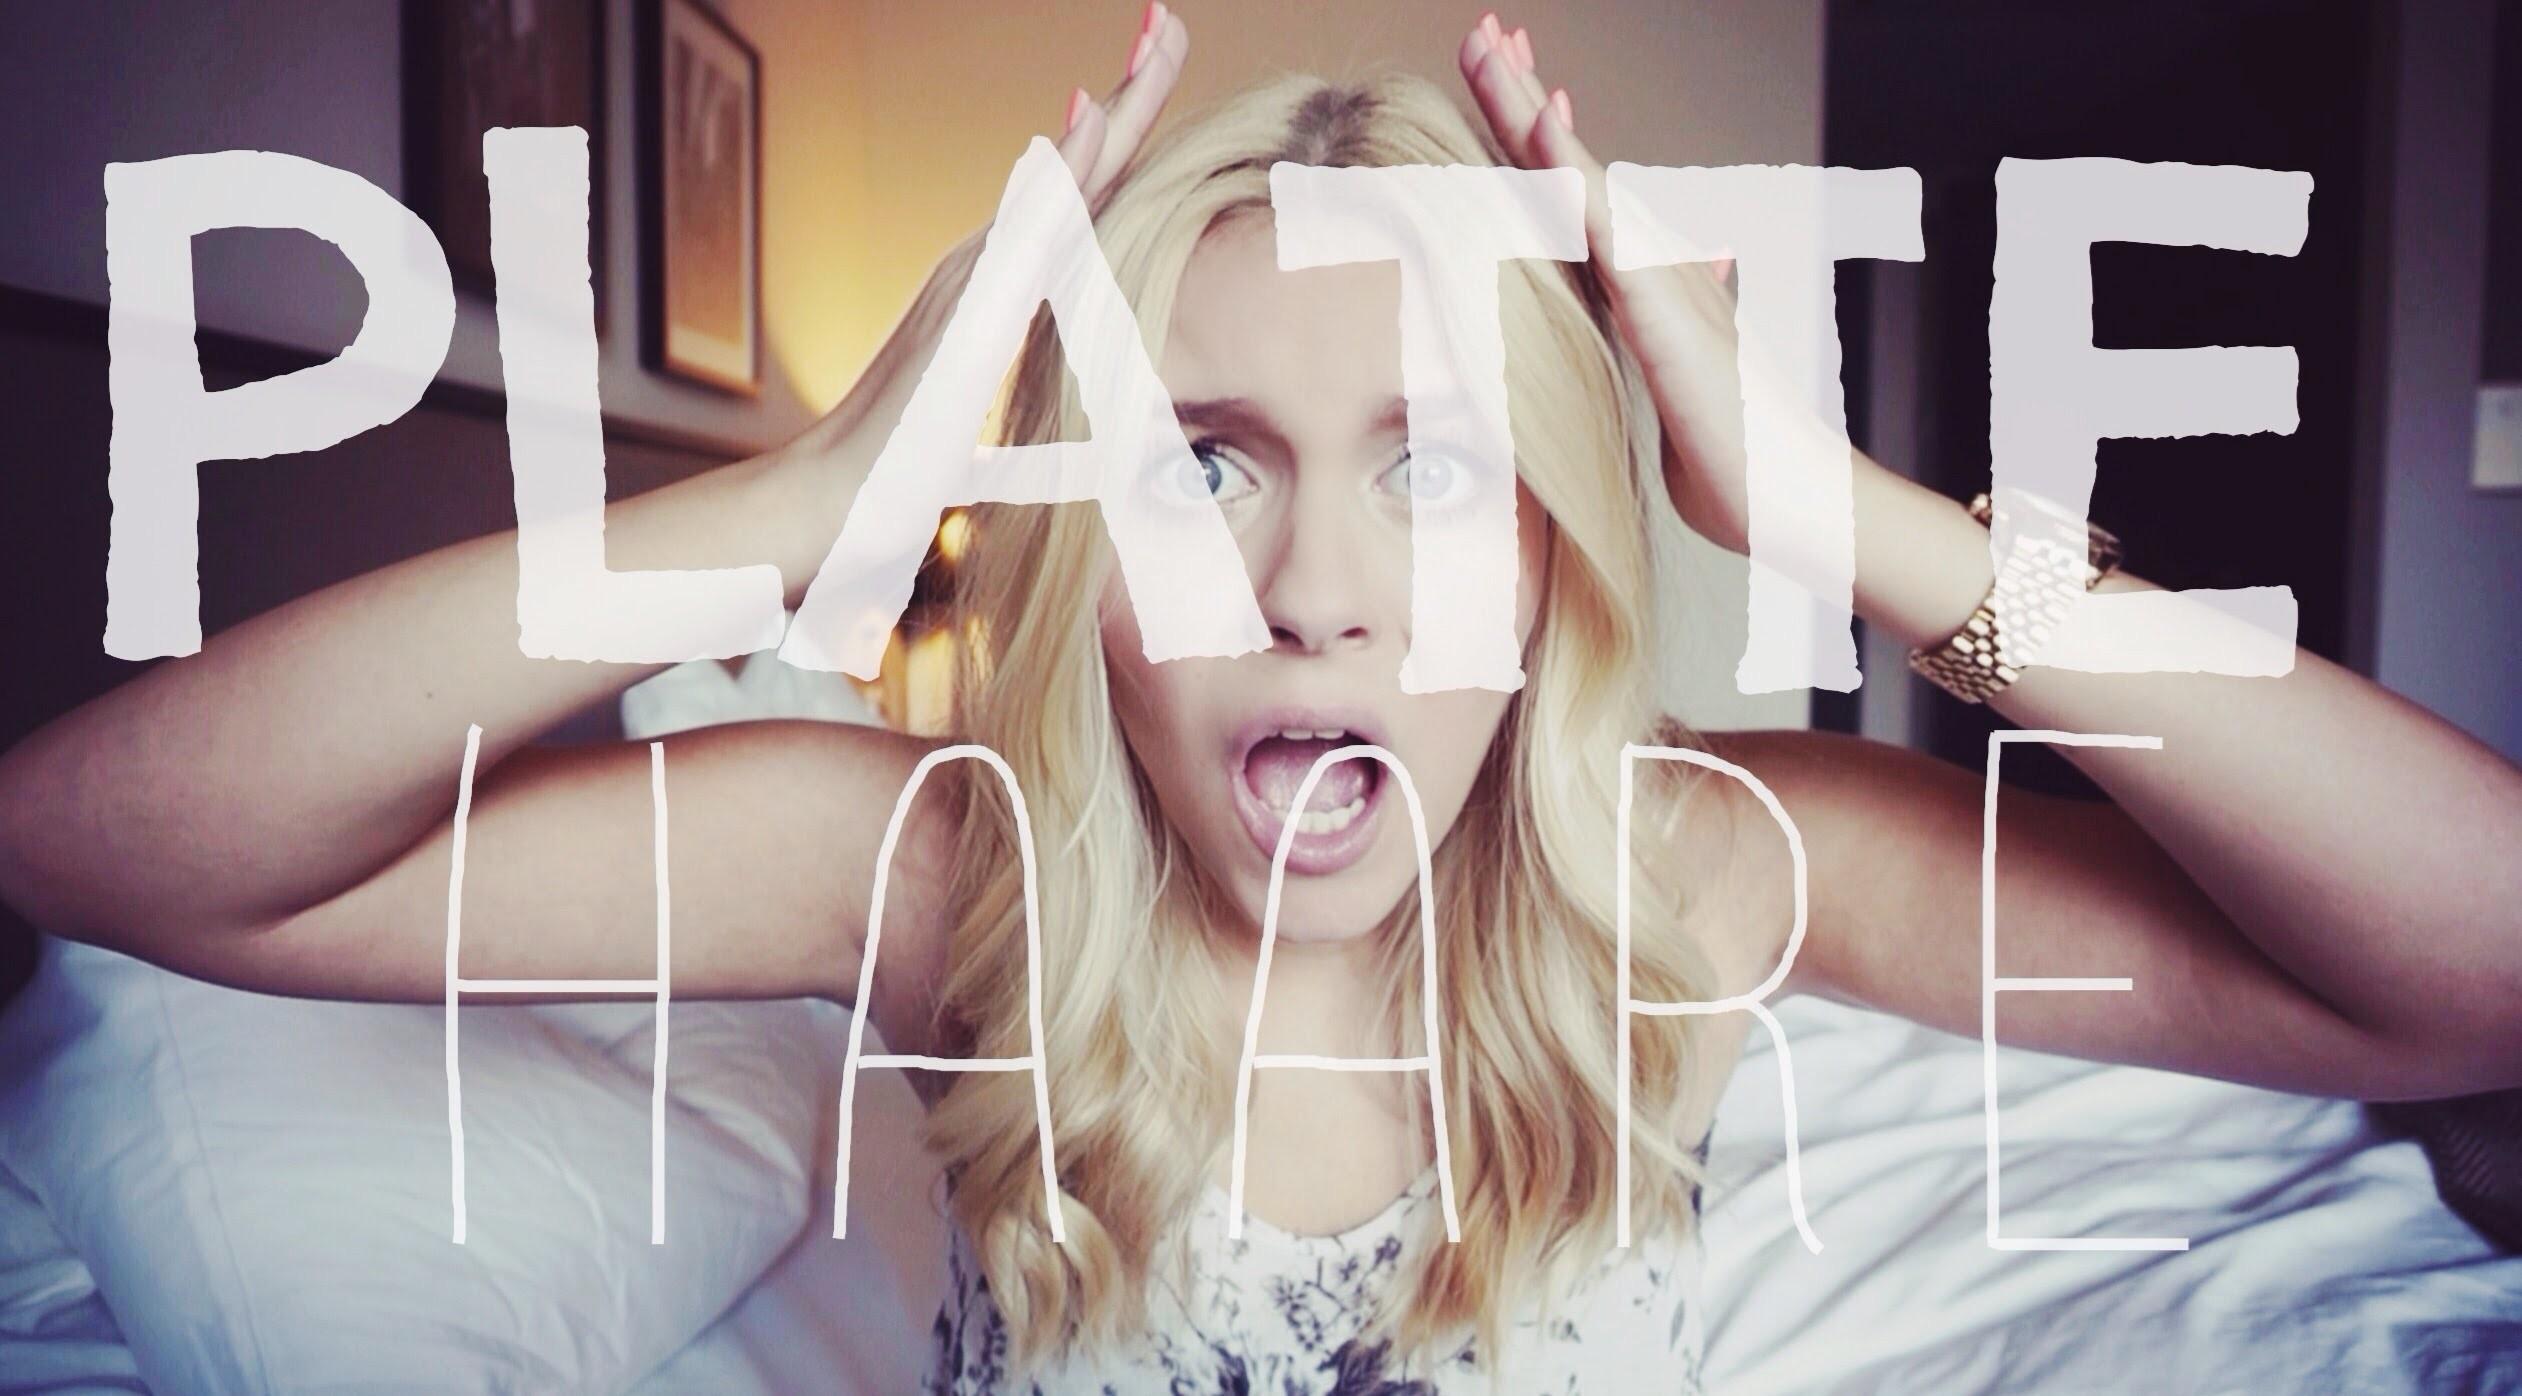 Problem : PLATTE HAARE ♡ CALL OF BEAUTY ♡ | Dagi Bee